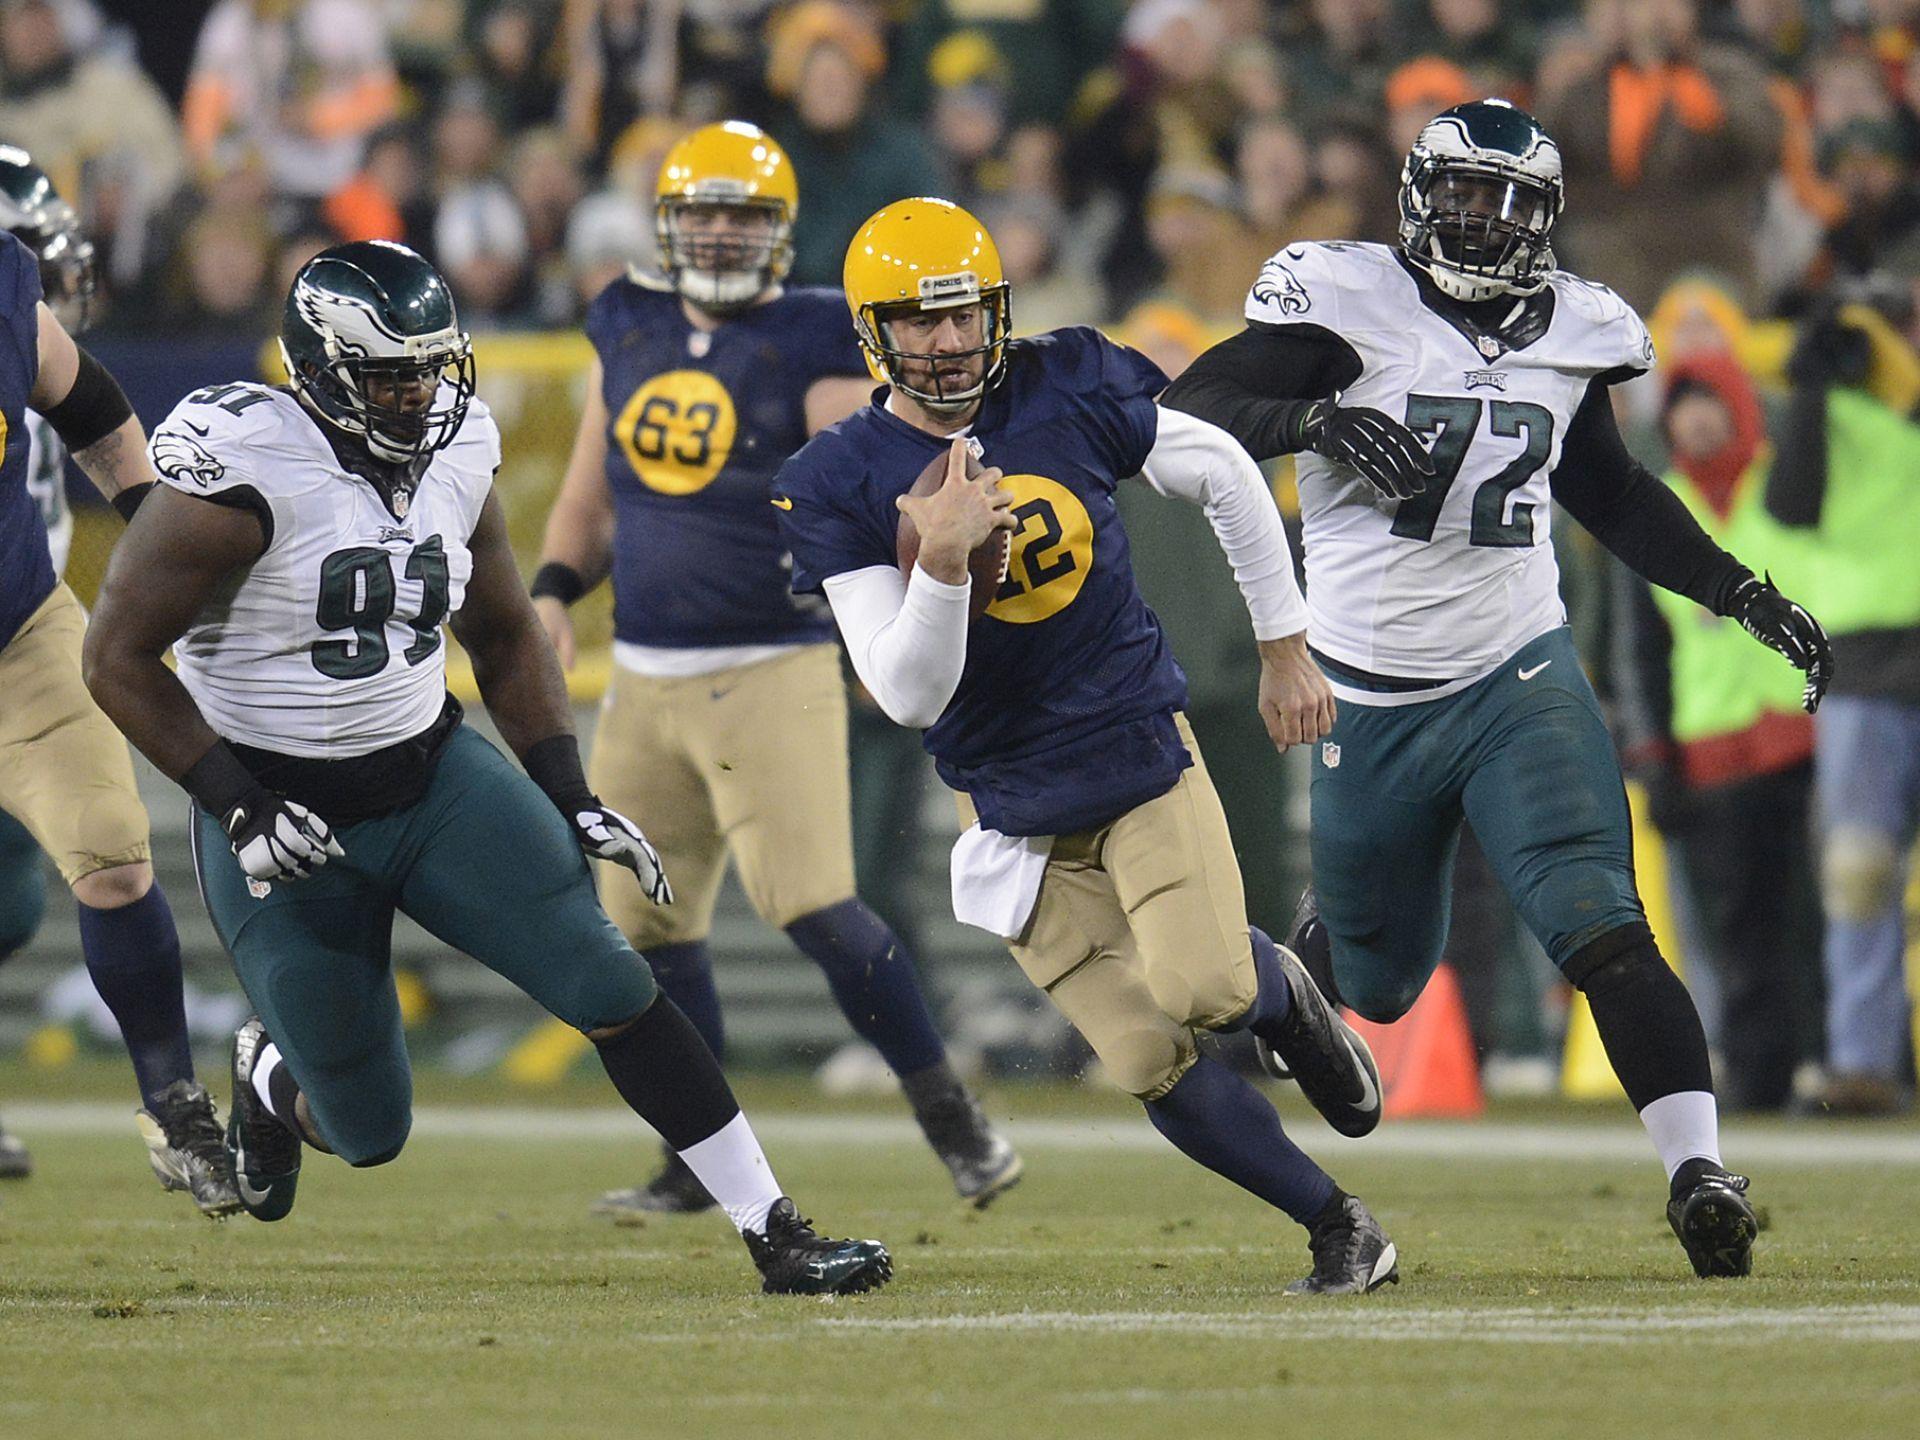 Week 11 In Photos Packers 53 Eagles 20 Packers Eagles Aaron Rodgers